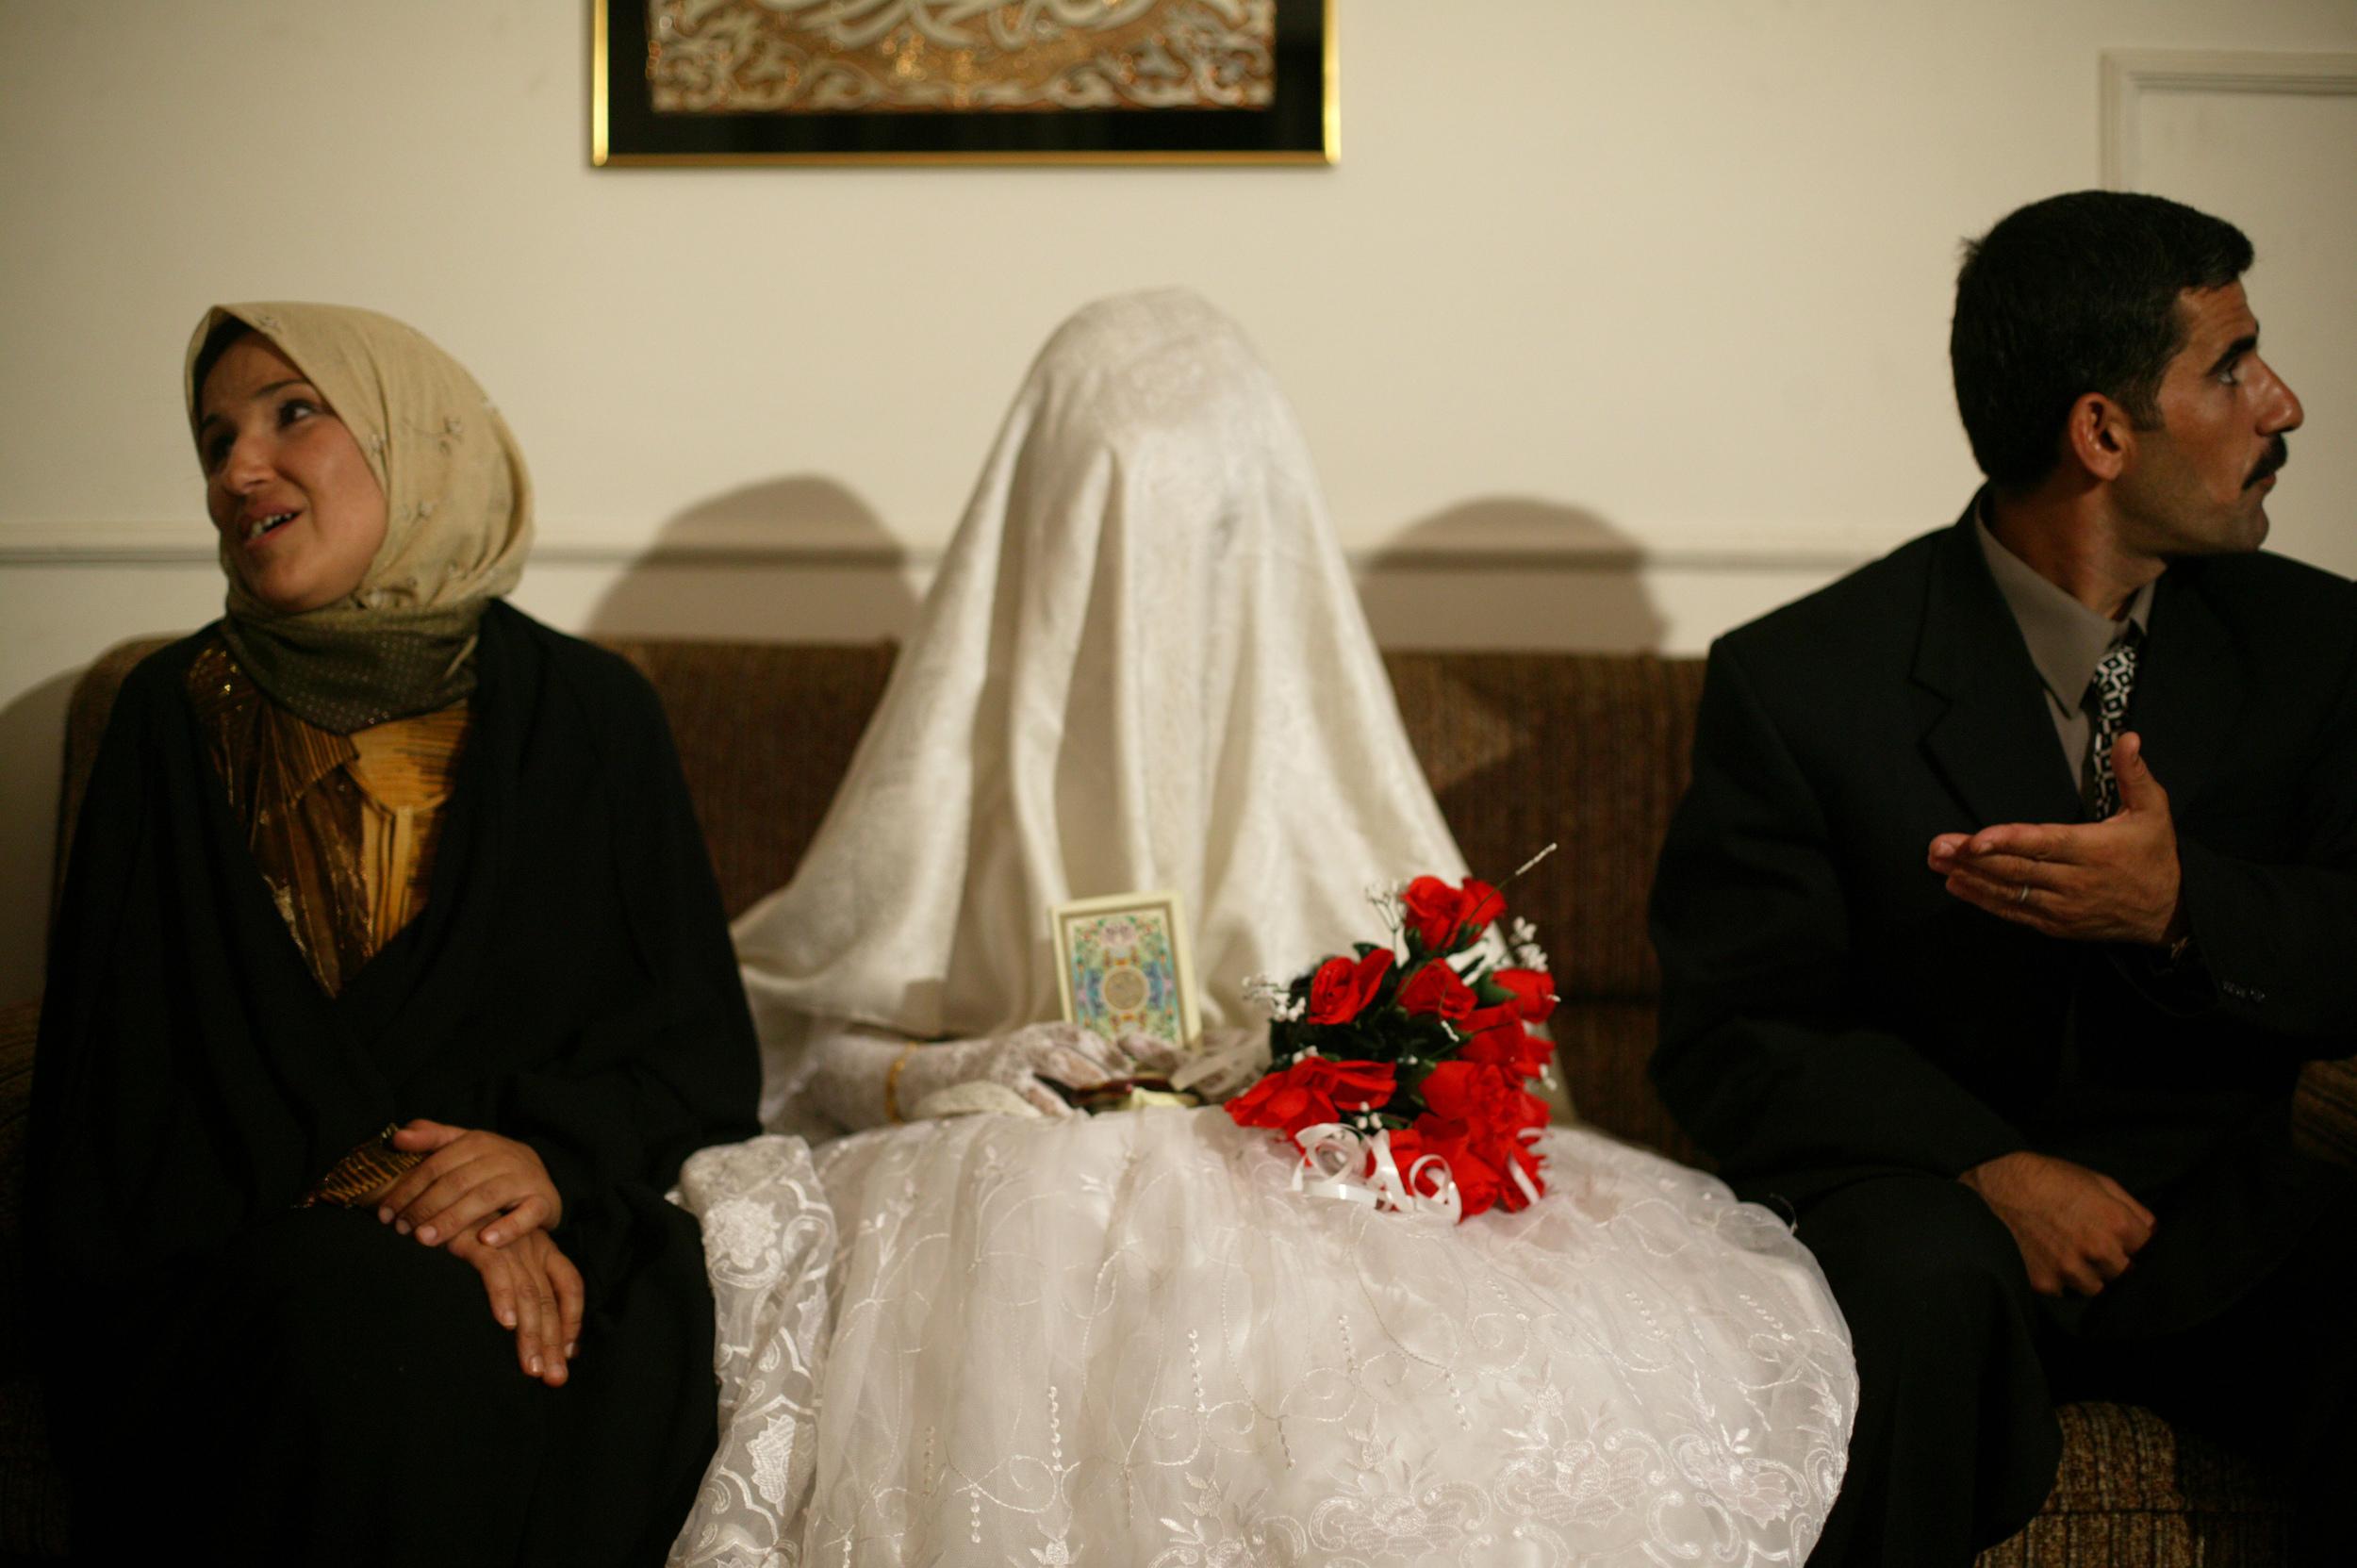 An Iraqi couple on their wedding night.